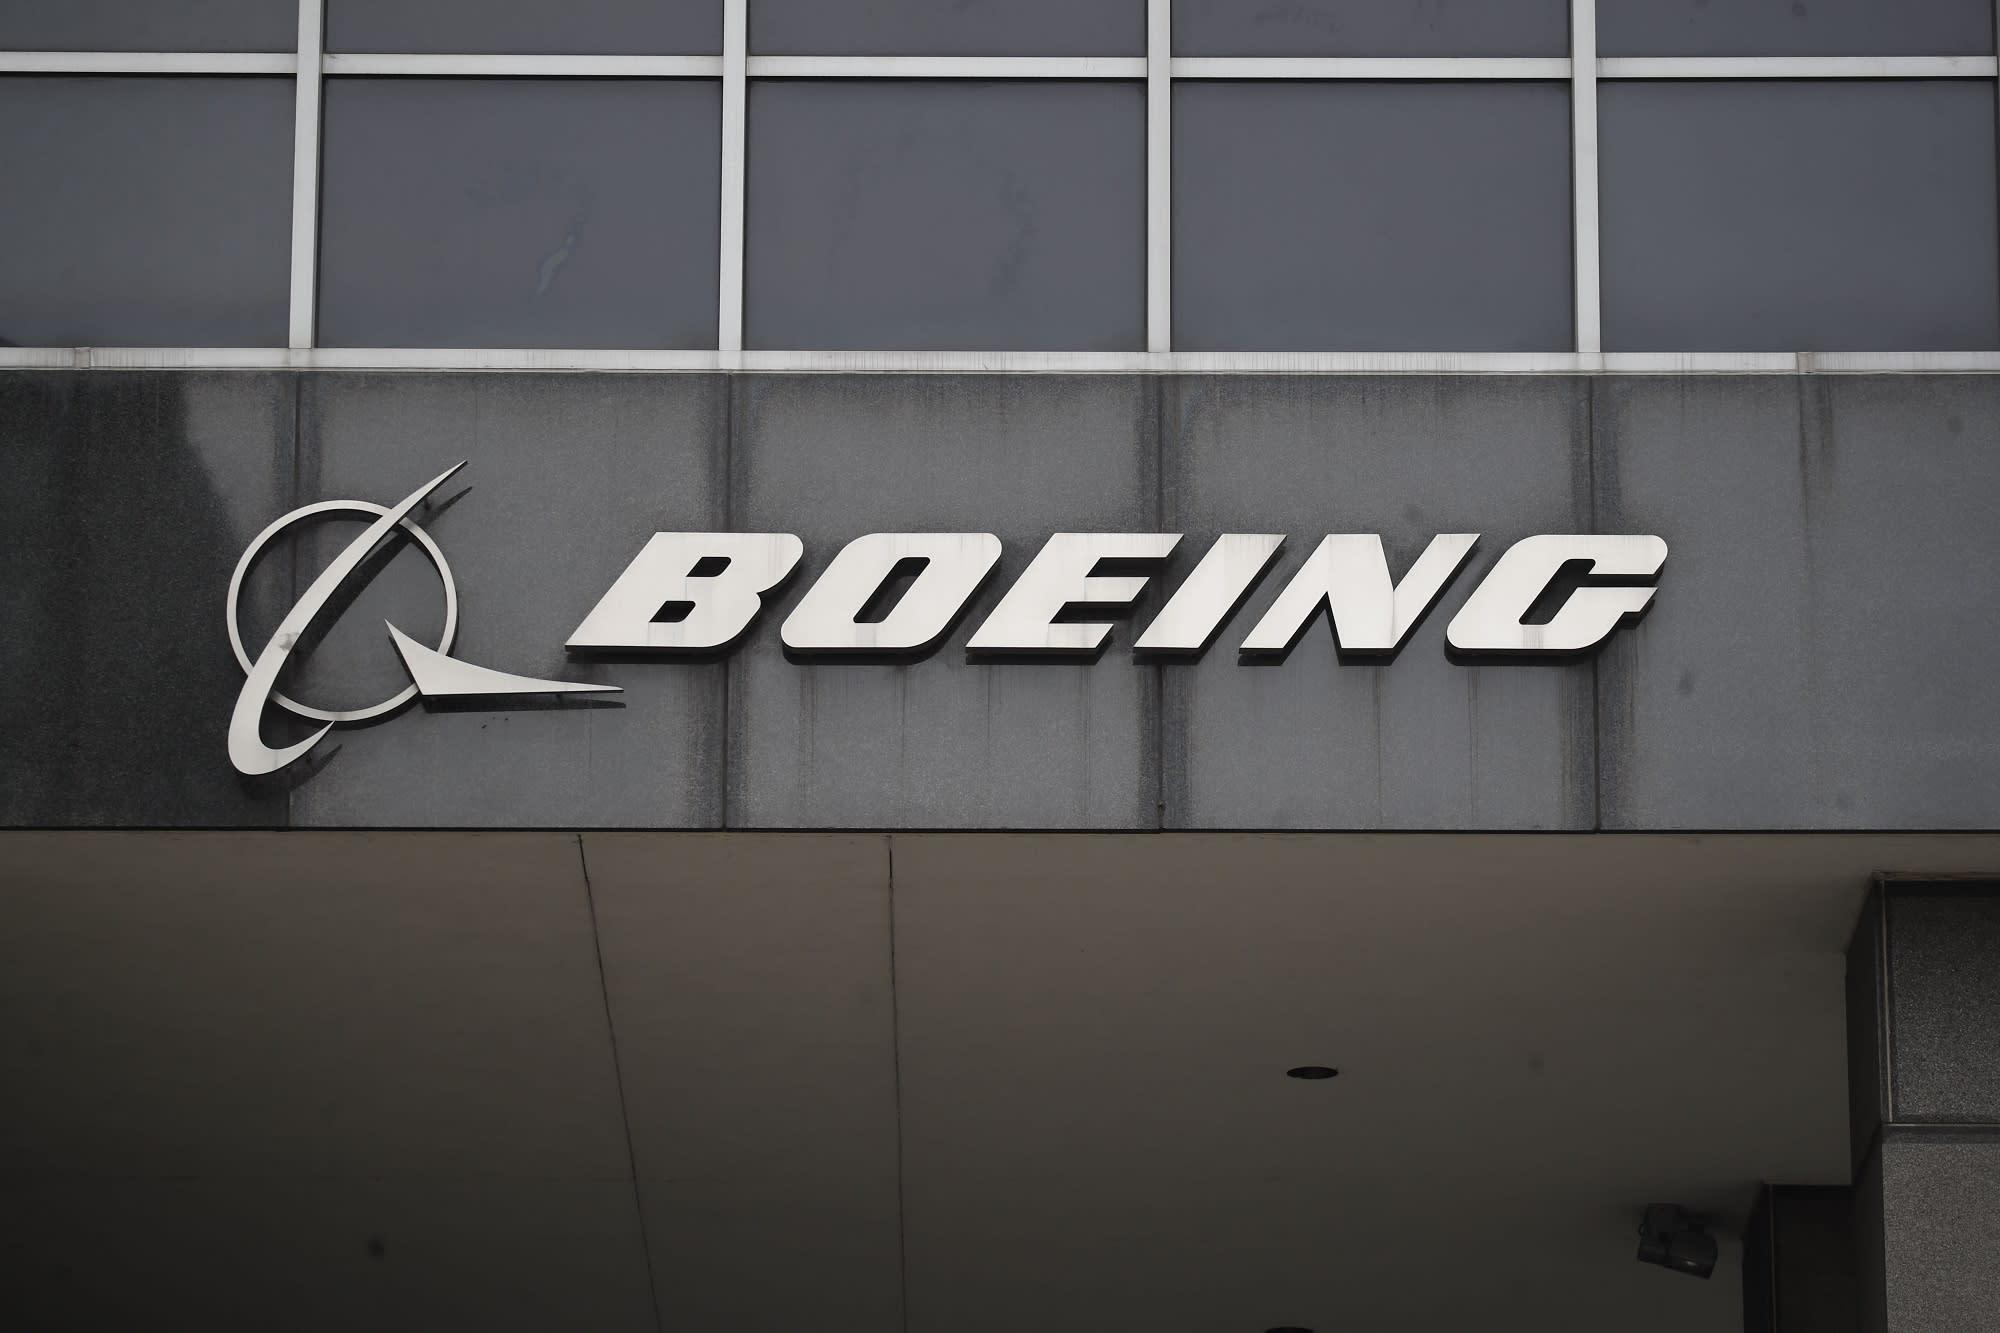 Boeing has more problems than the 737 Max, Rep. John Garamendi warns